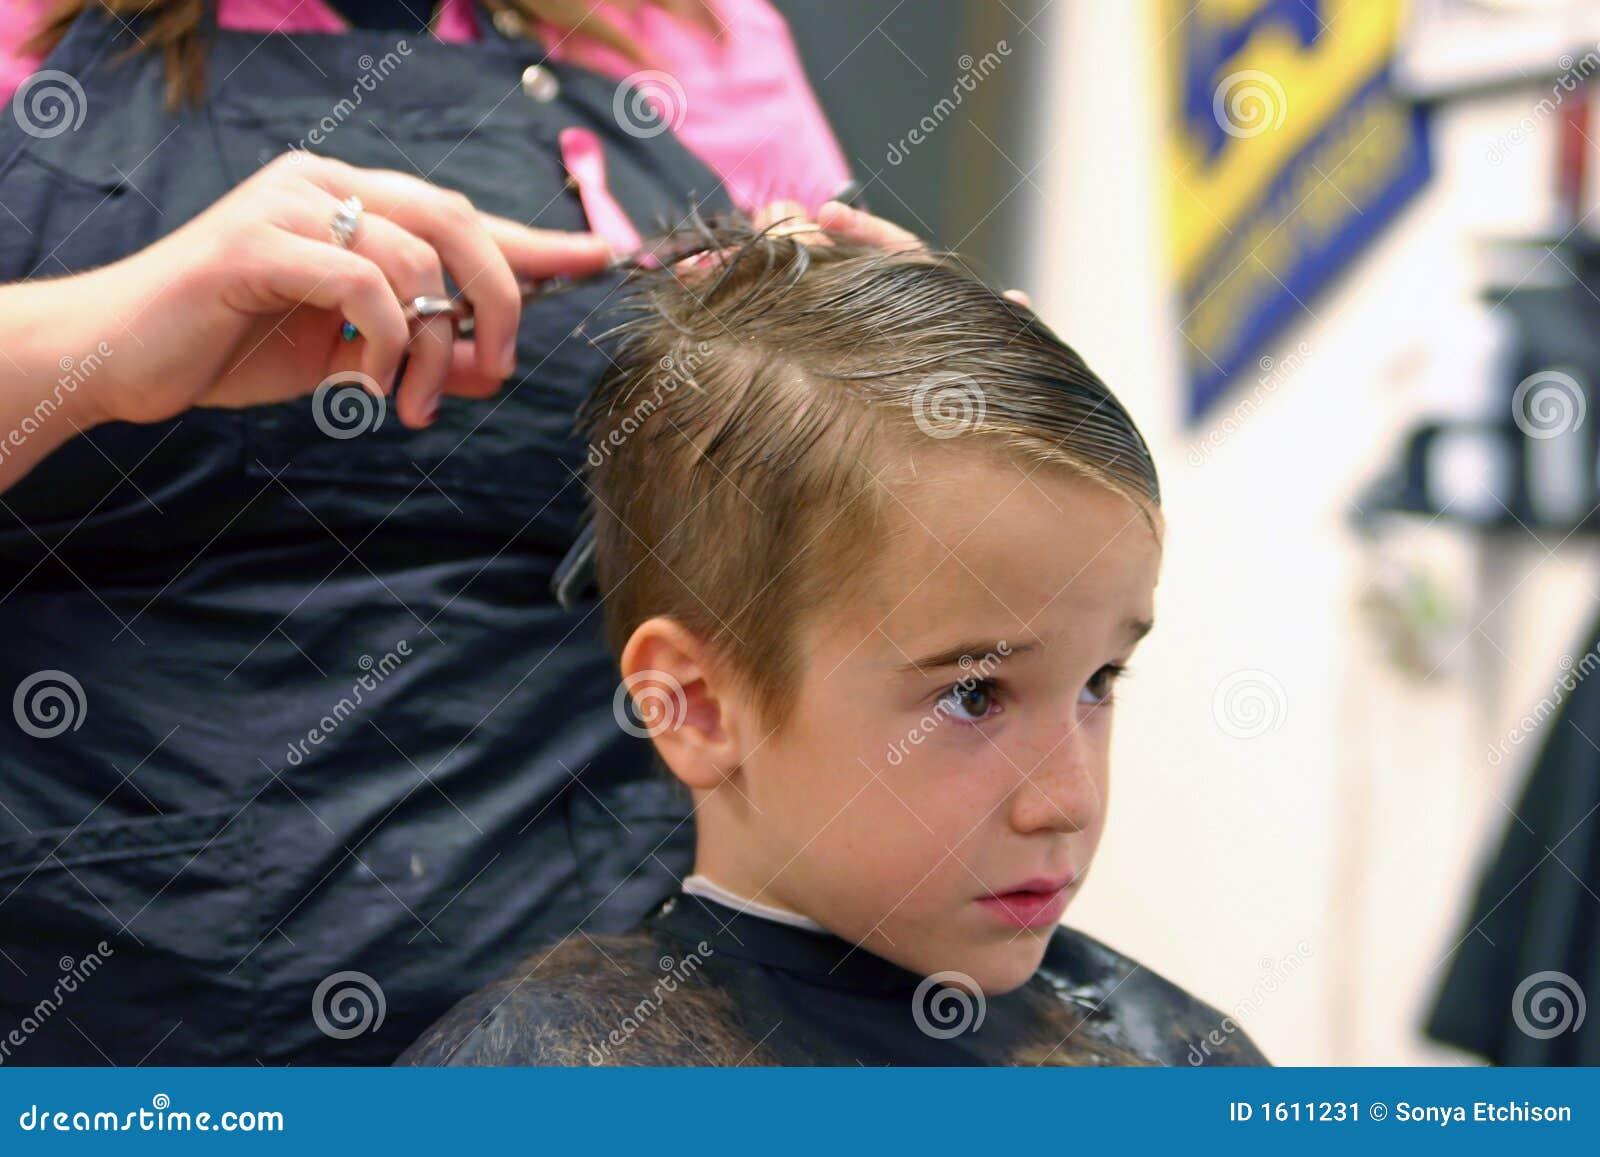 Hair Photos Boy Download: Boy Getting Haircut Stock Image. Image Of Comb, Haircut